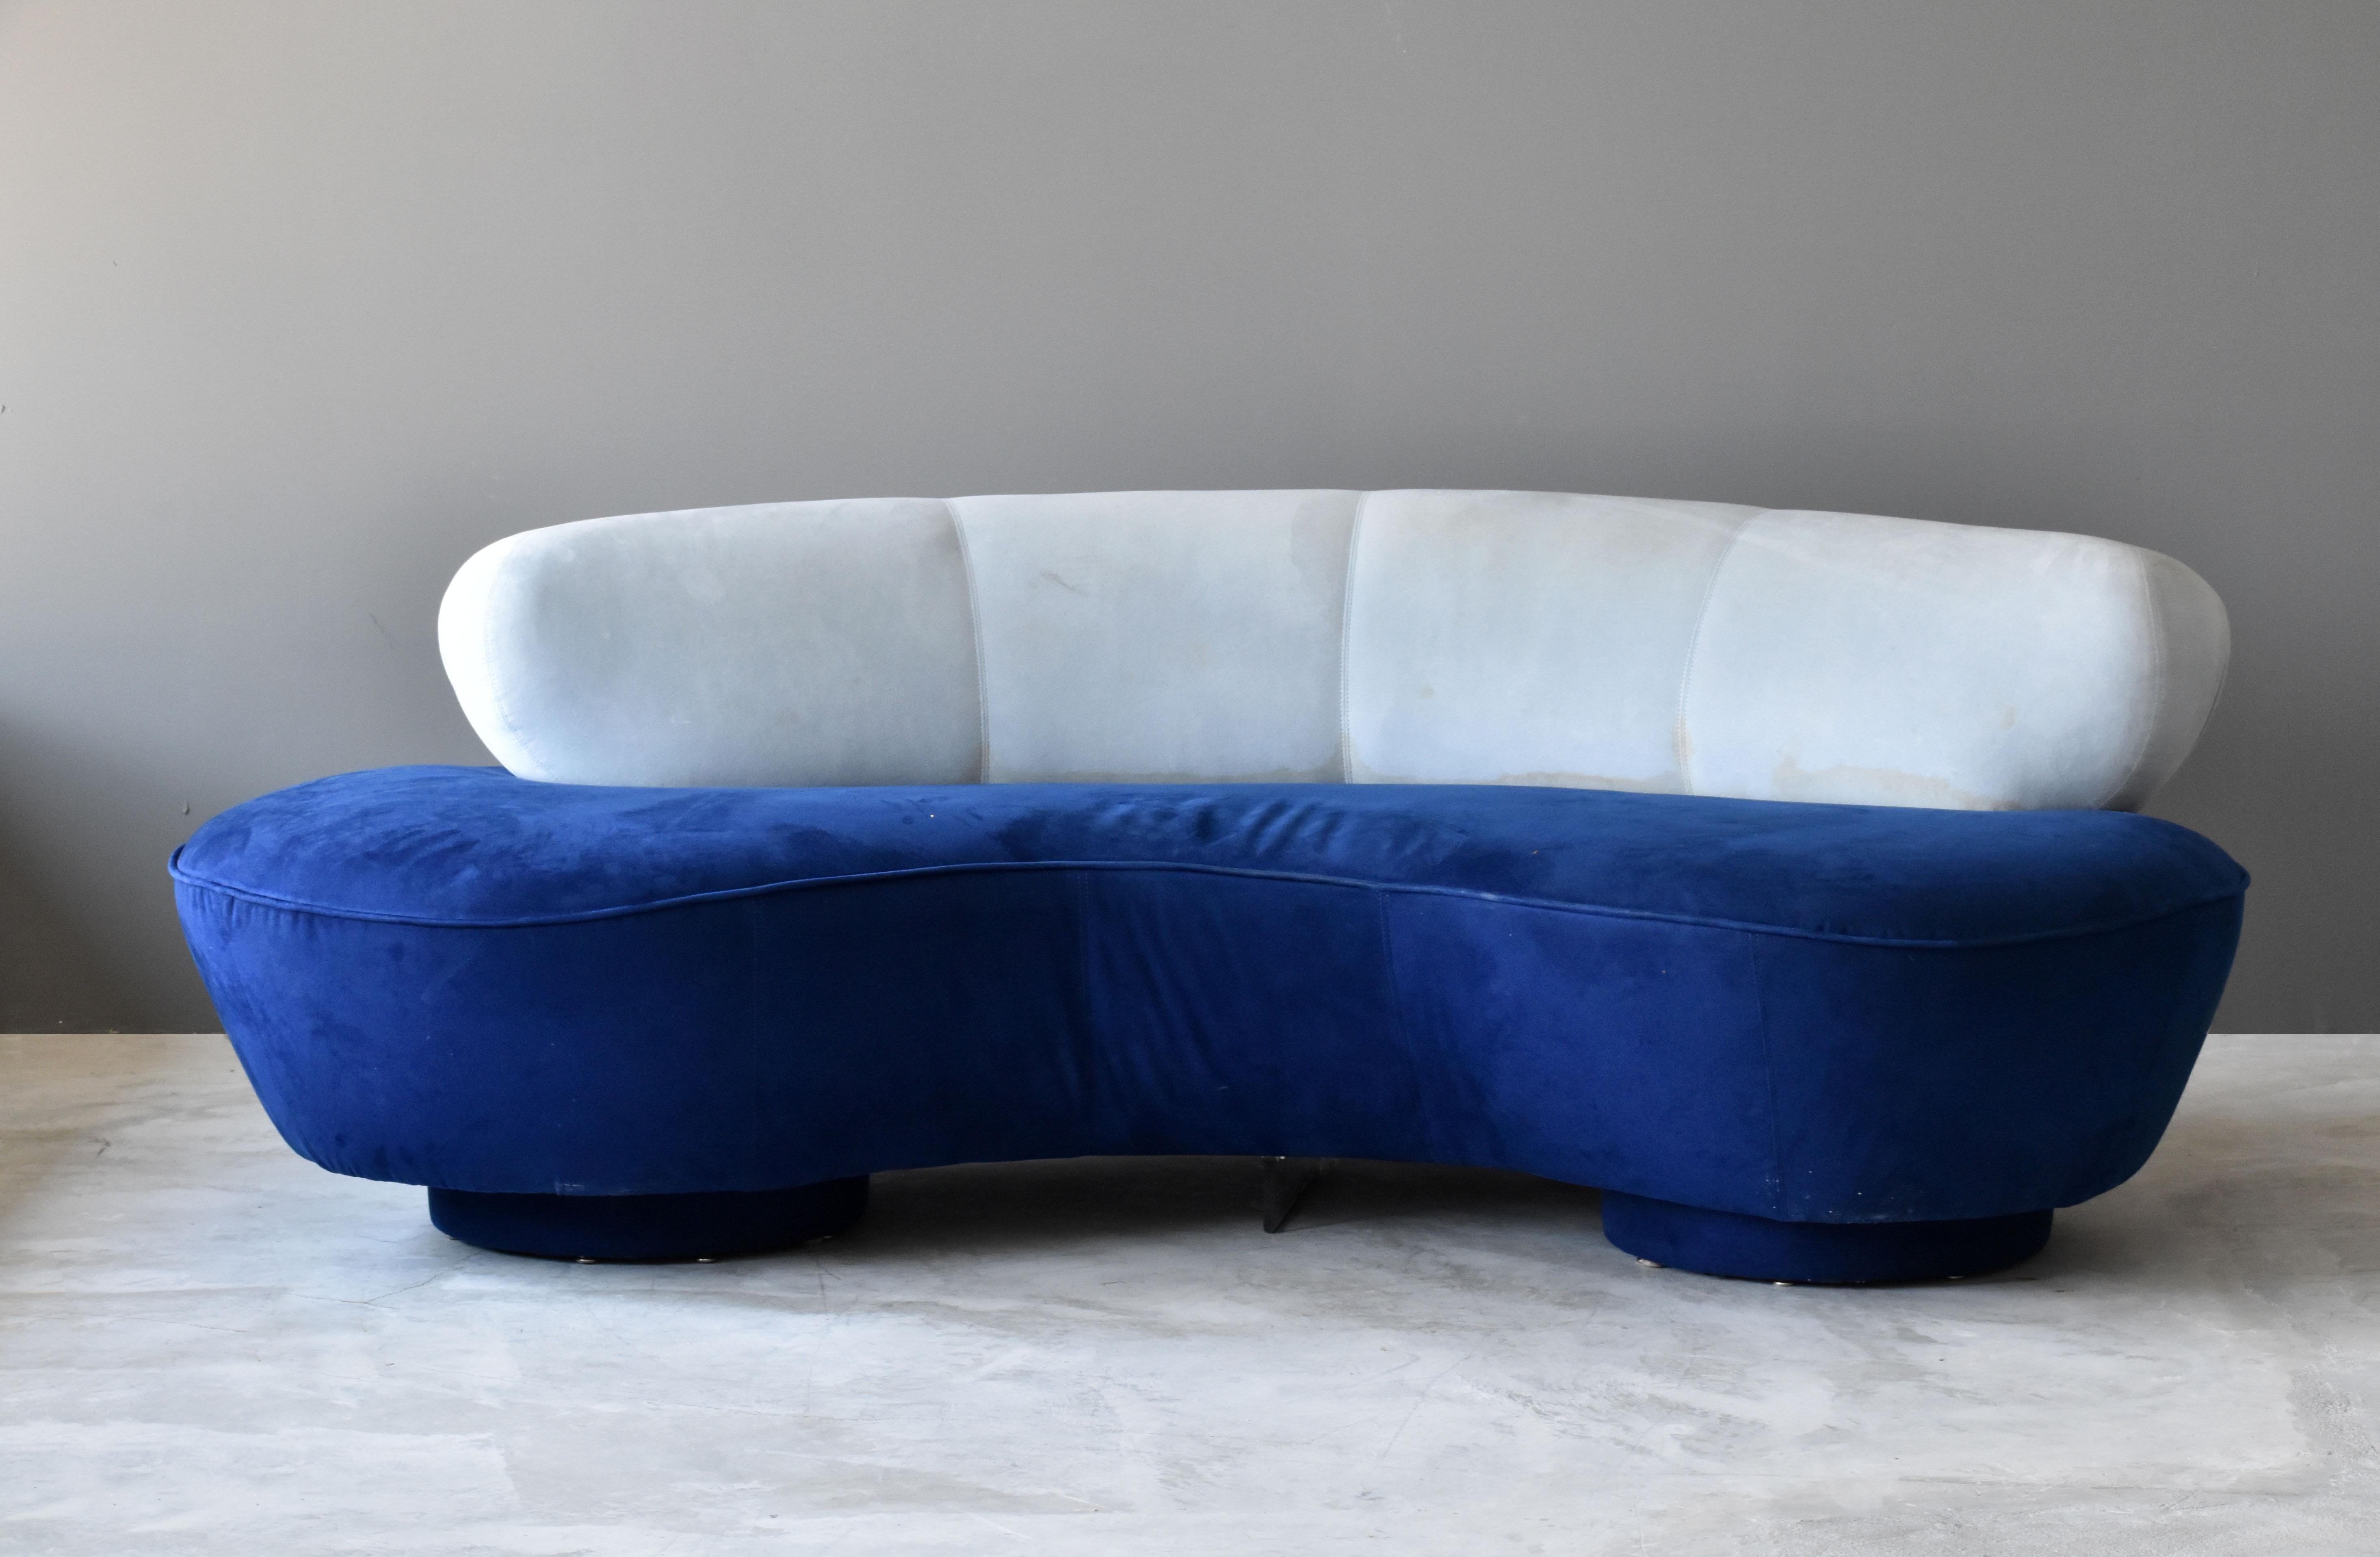 Marvelous Vladimir Kagan Long Island Sofa Blue White Suede Acrylic 1975 Directional Interior Design Ideas Clesiryabchikinfo